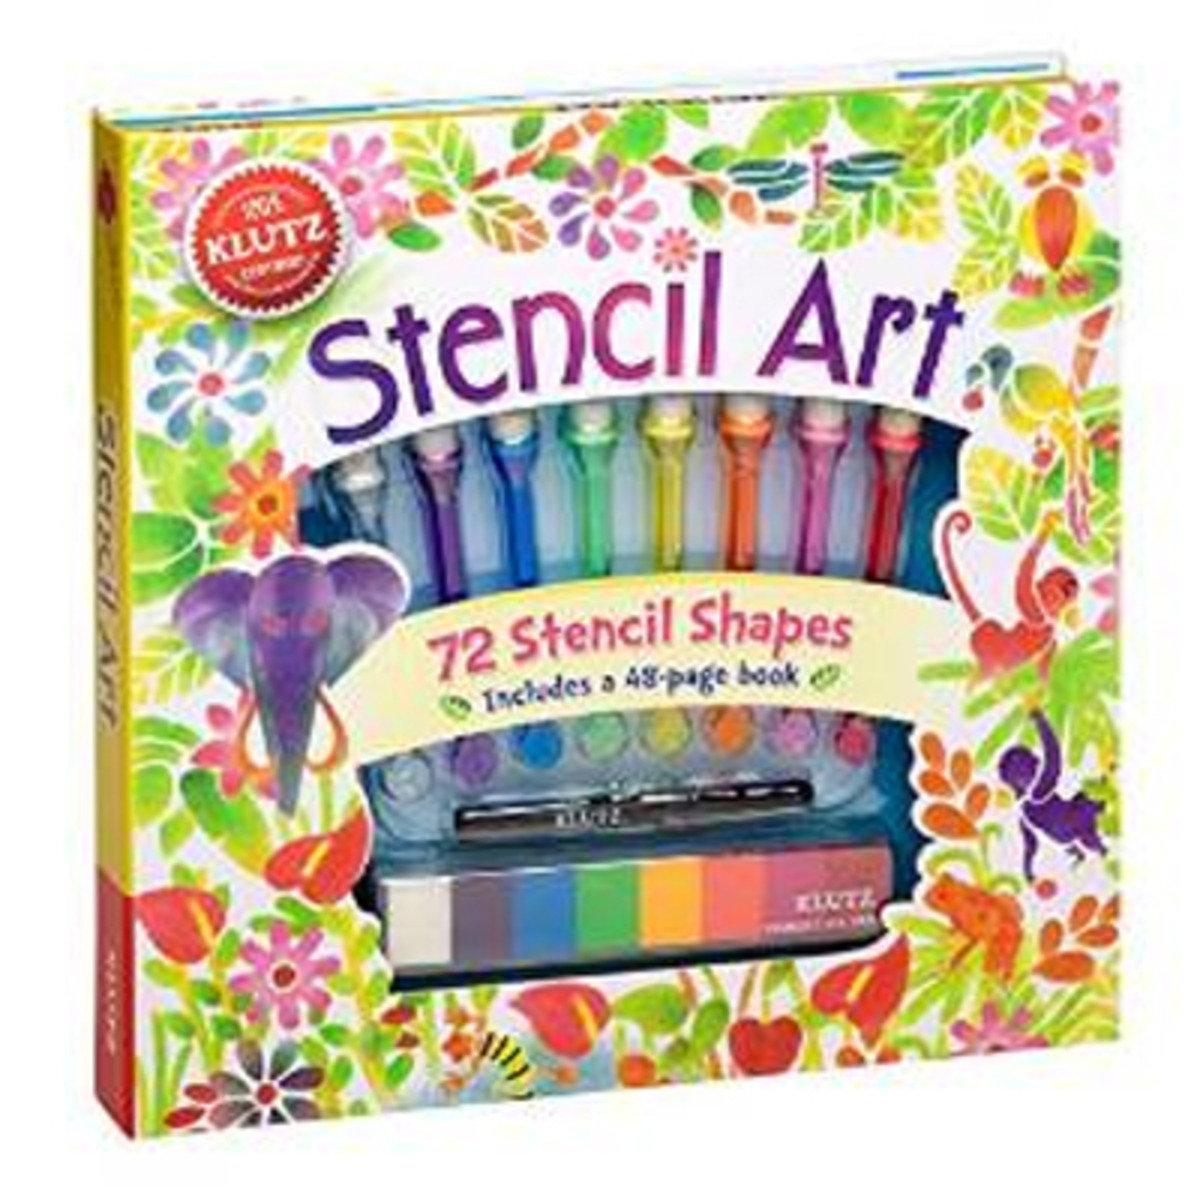 STENCIL ART 9780545561662